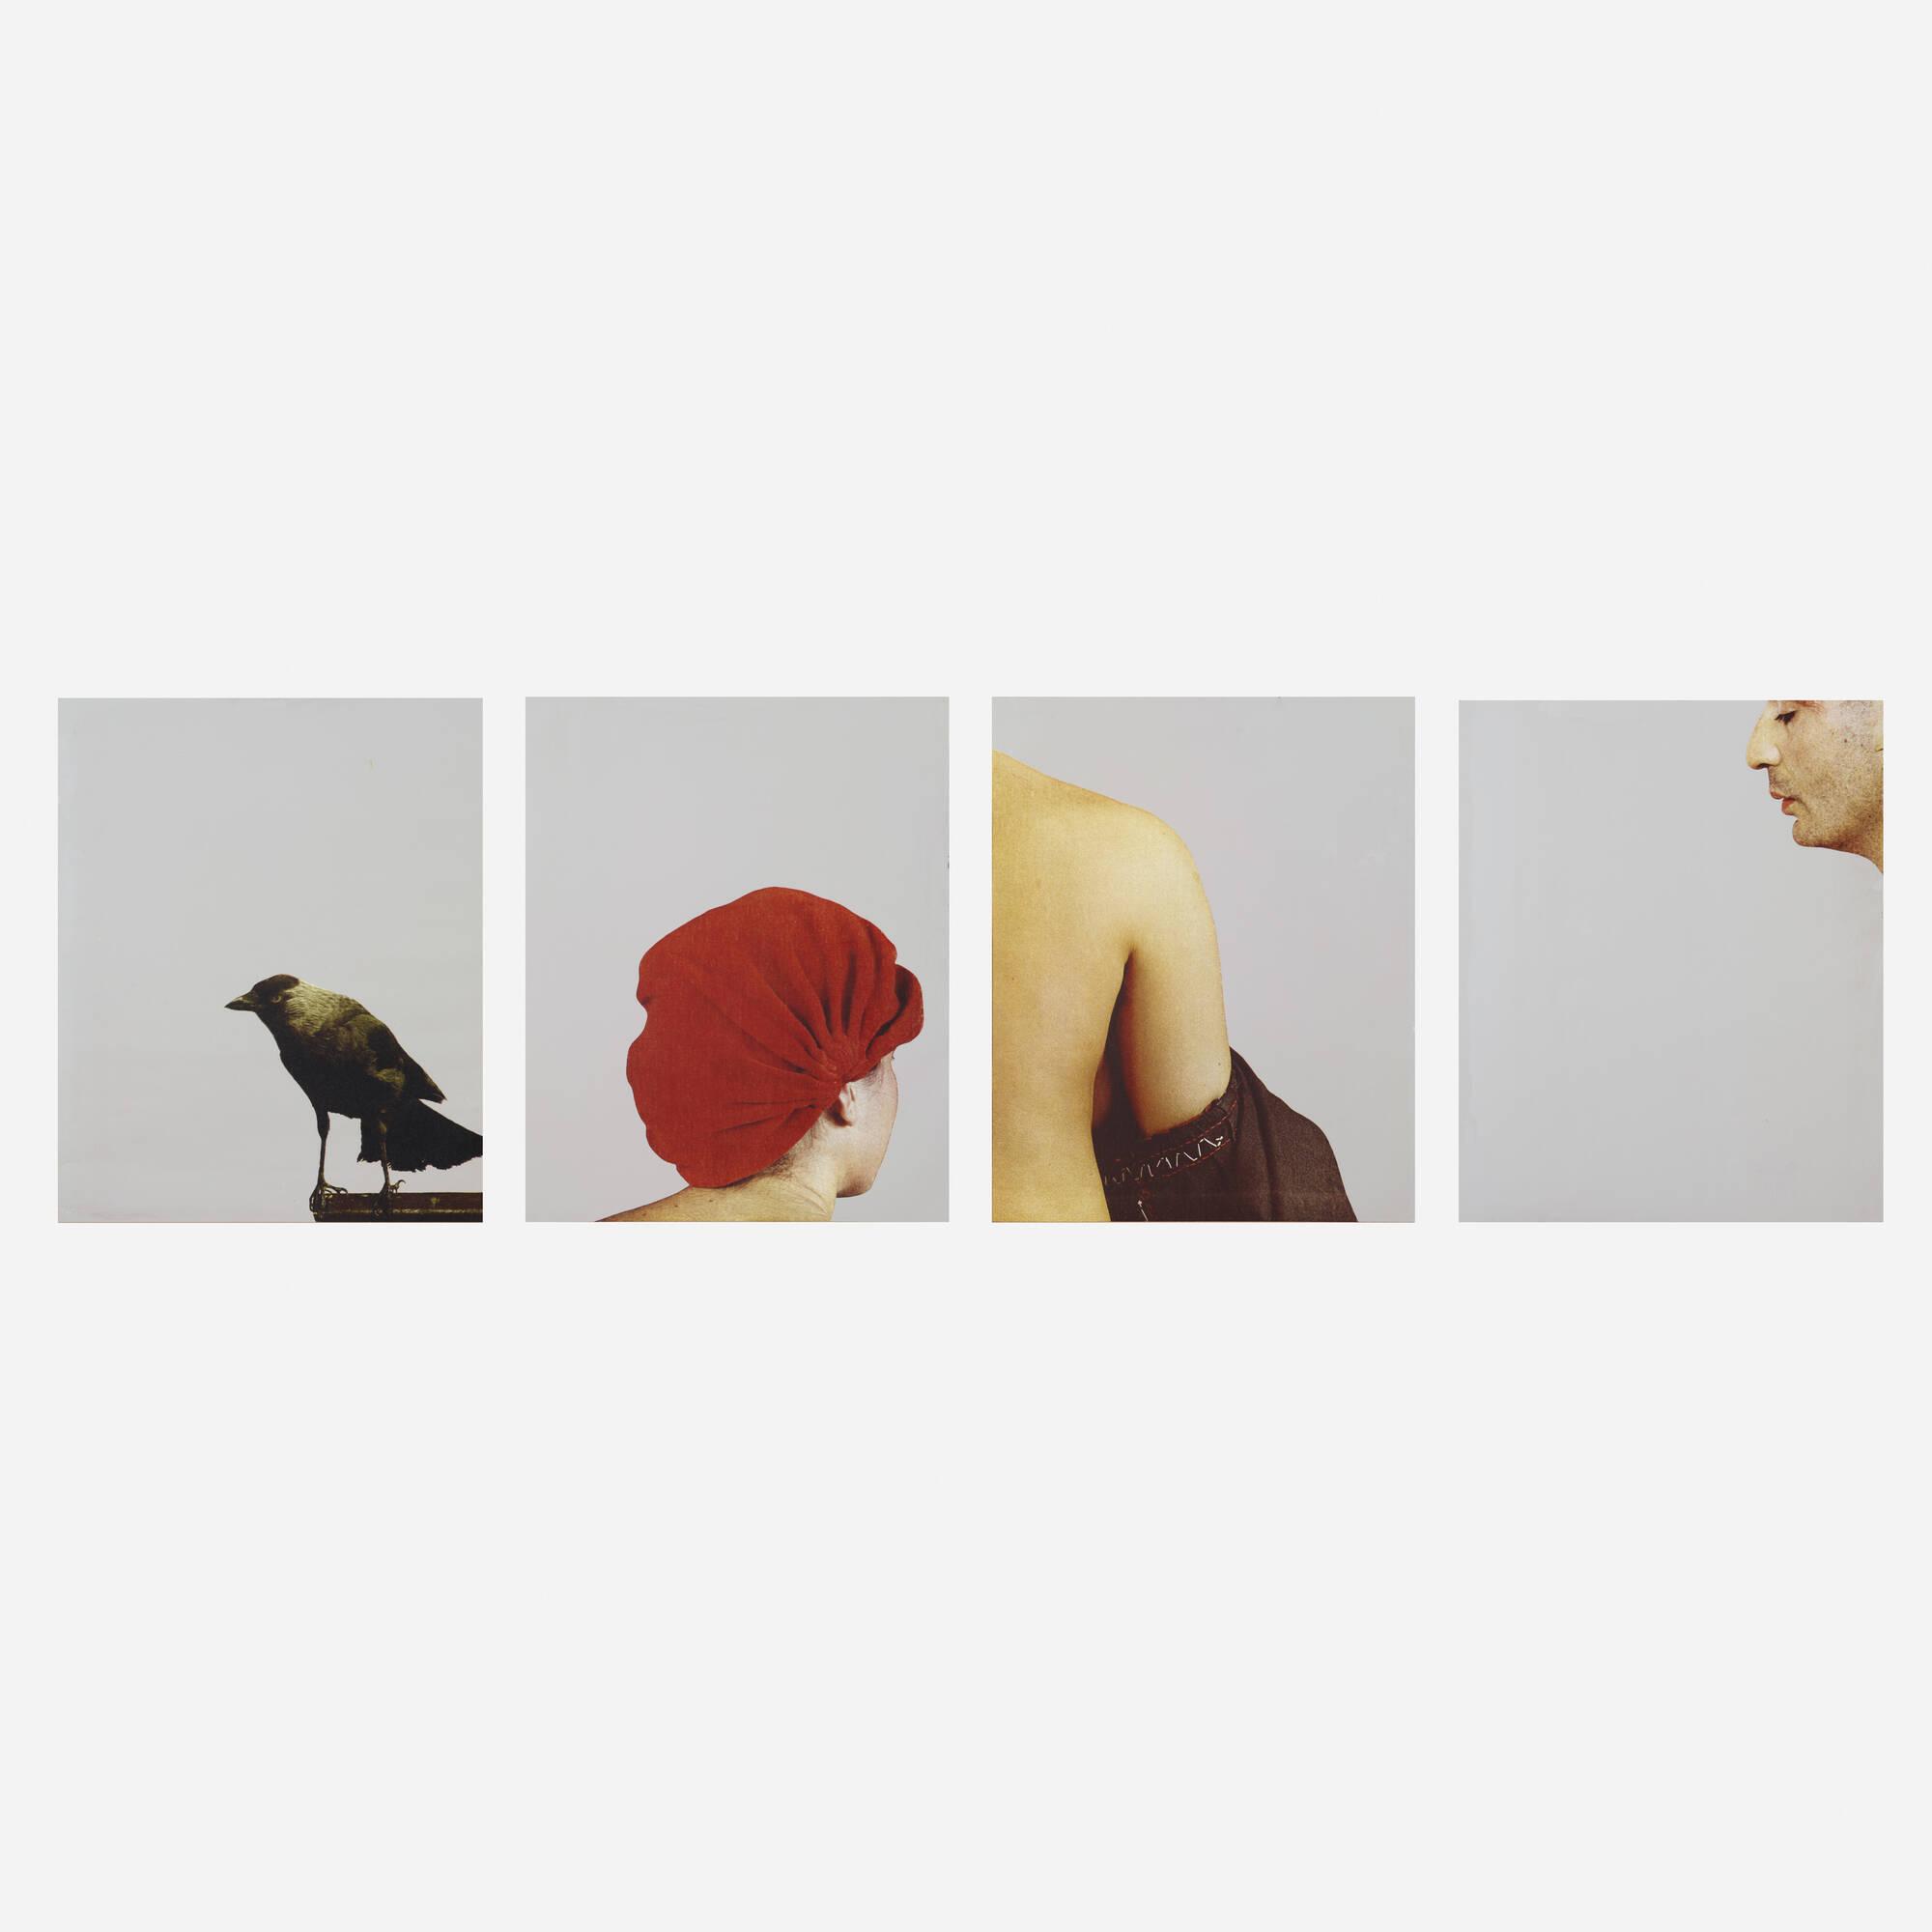 160: Michelangelo Pistoletto / Cartella A (portfolio of four works) (1 of 1)